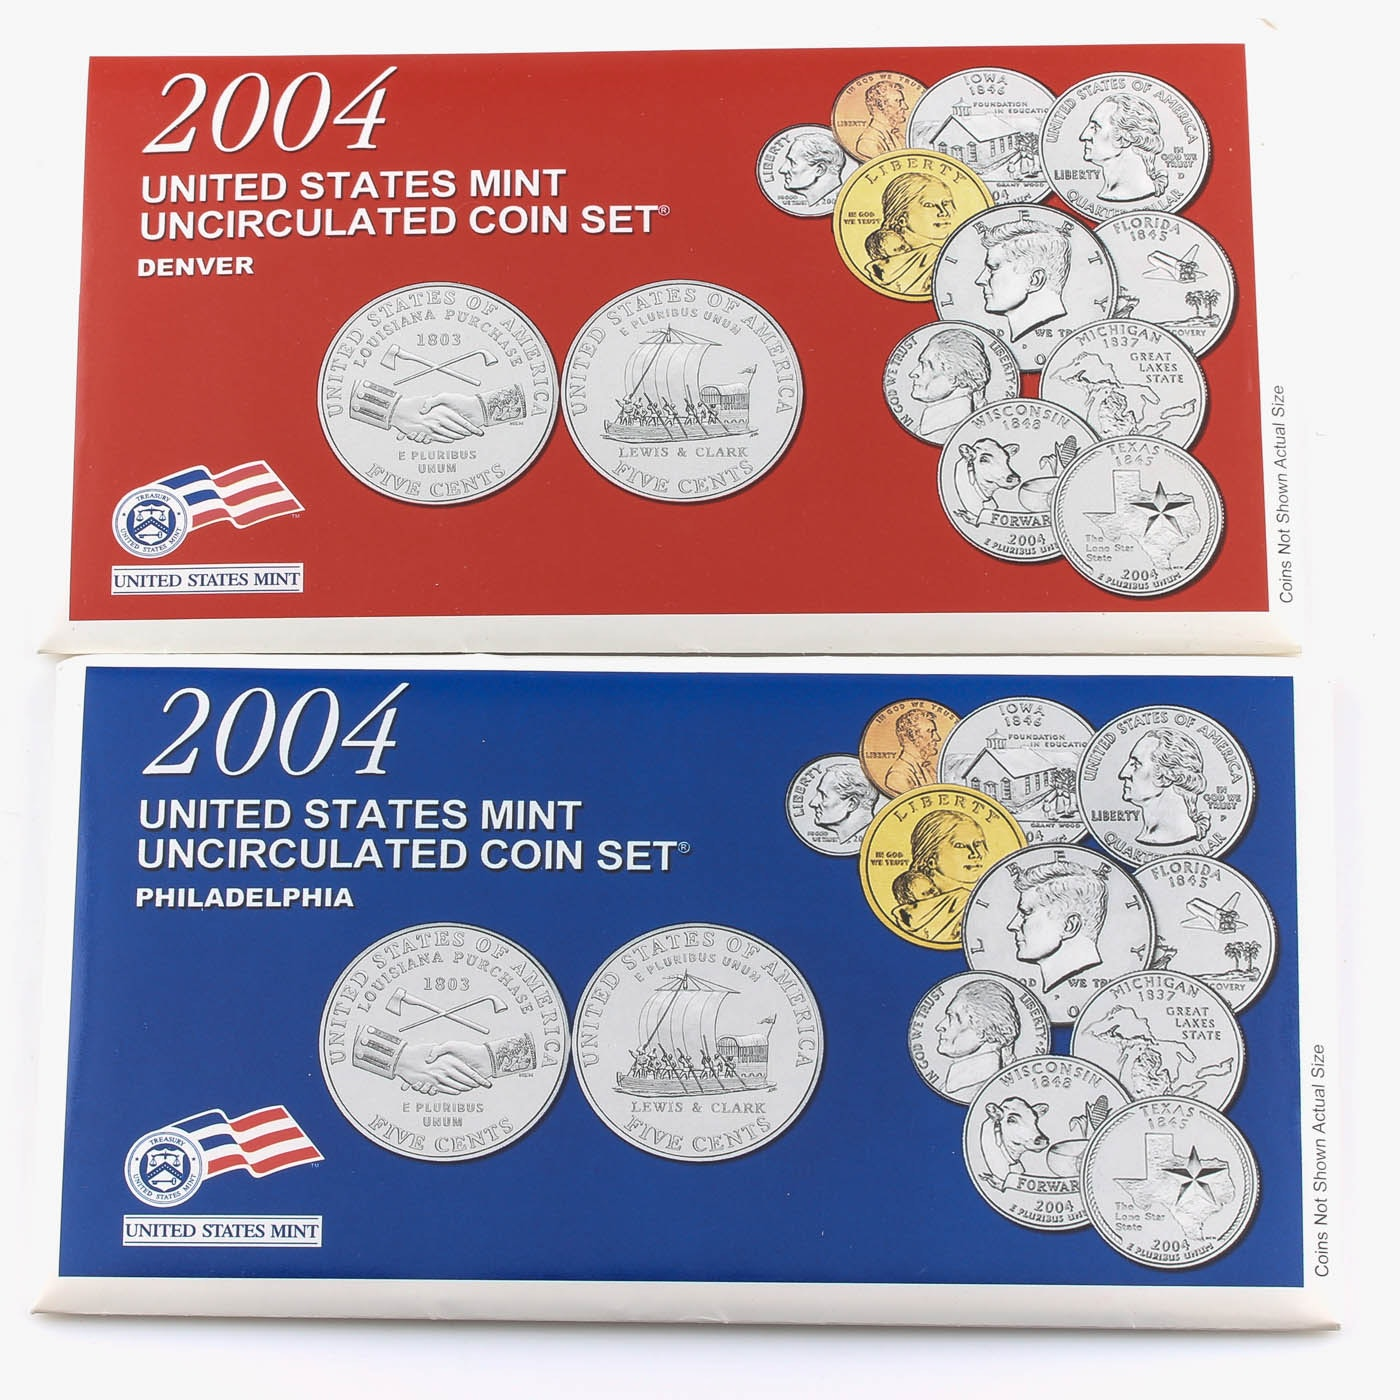 2004 United States Uncirculated Denver and Philadelphia Mint Set